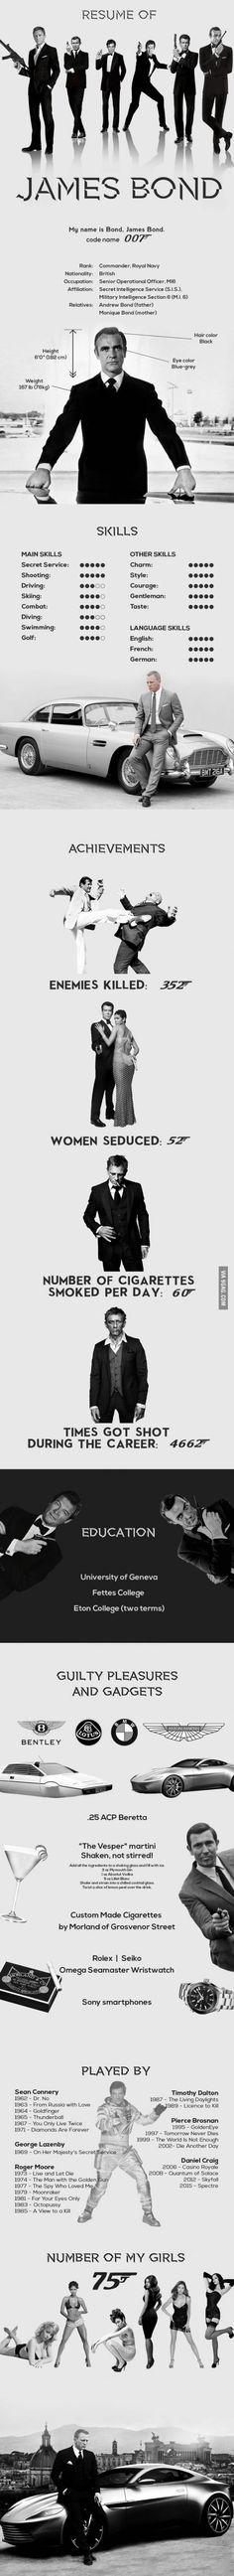 Ultimate resume of James Bond